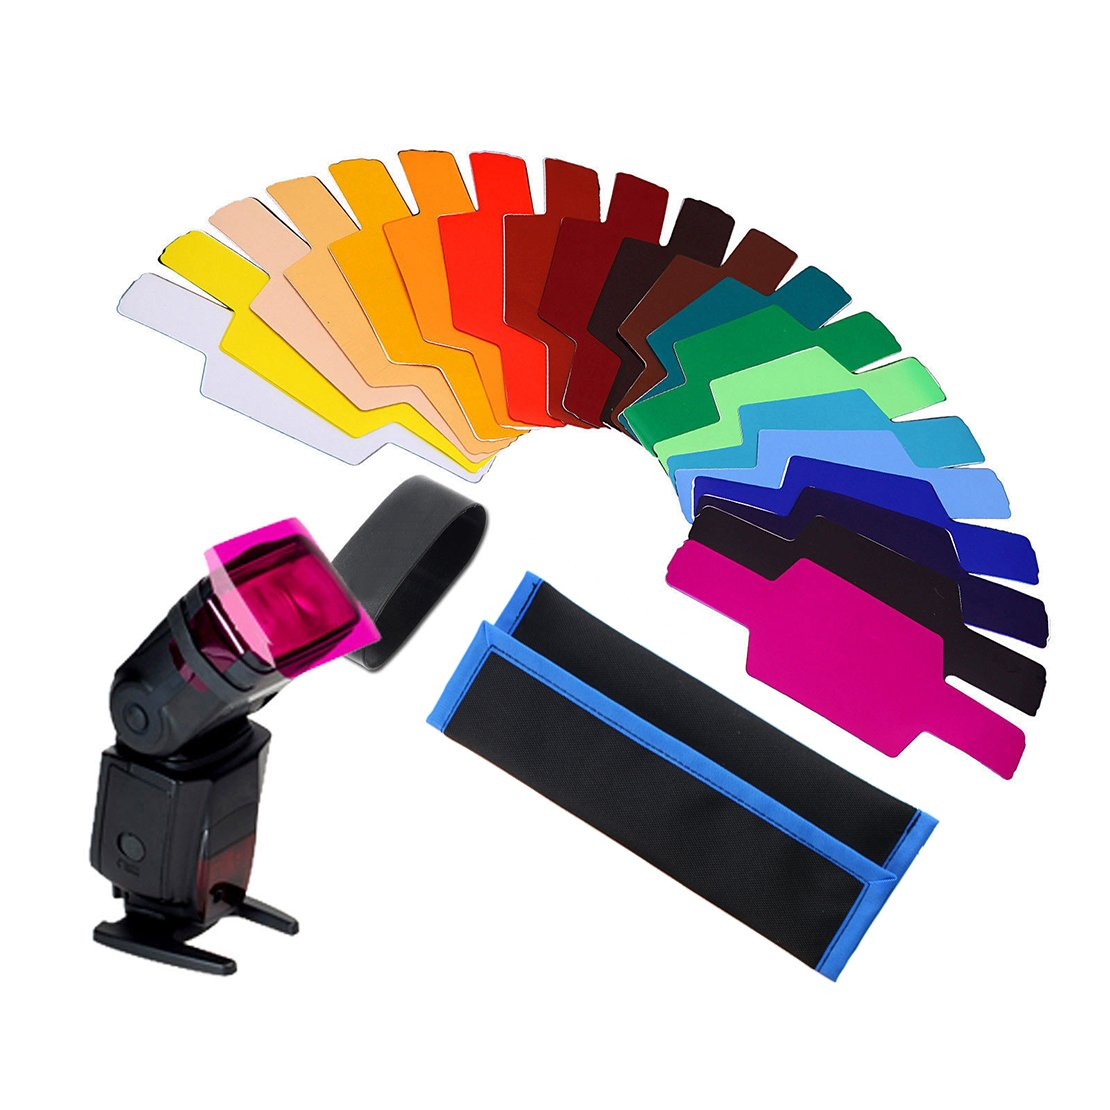 AGPtek 20 Color Photographic Gels Filter for Canon/Nikon/Oloong/Yongnuo FLash/Speedlite